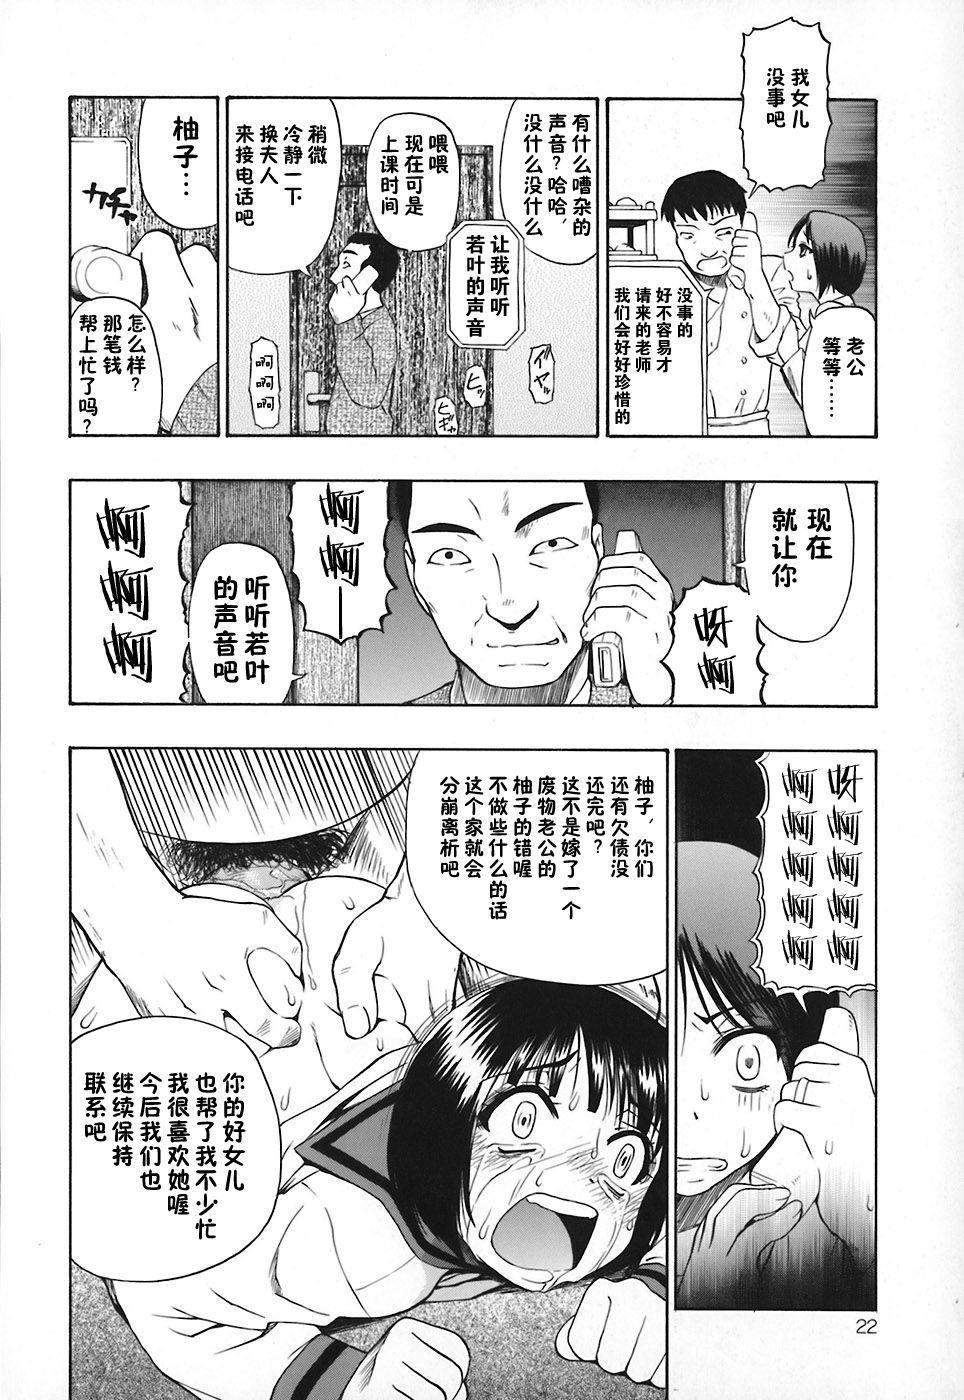 Akutoku no Sakae - Prosperites du Vice 23